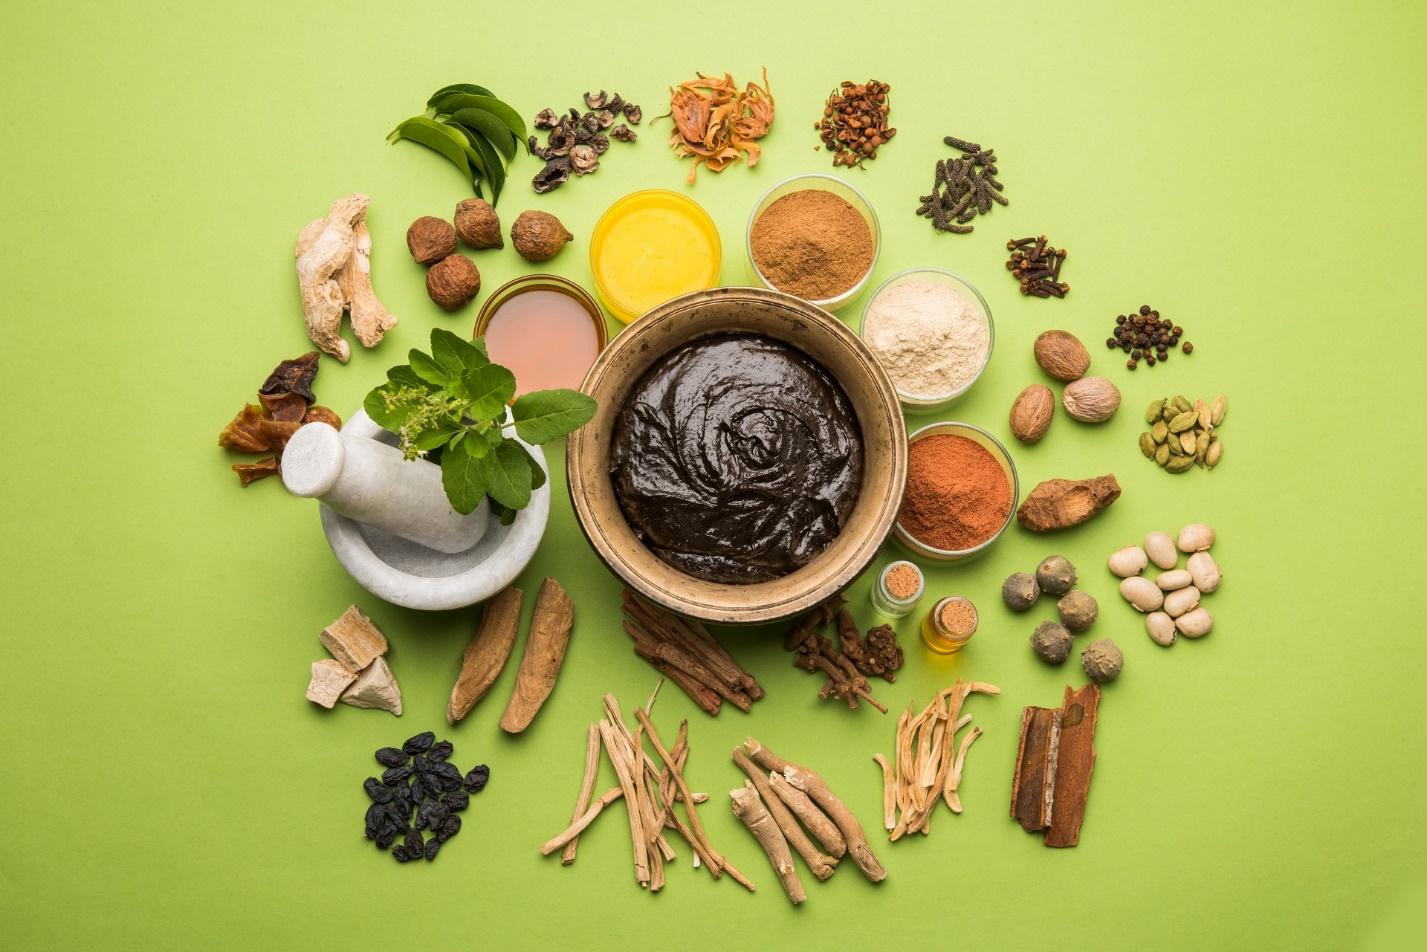 https://blog.ijugaad.com/file/2018/08/chyawanprash-ayurvedic-supplement-healthy.jpg